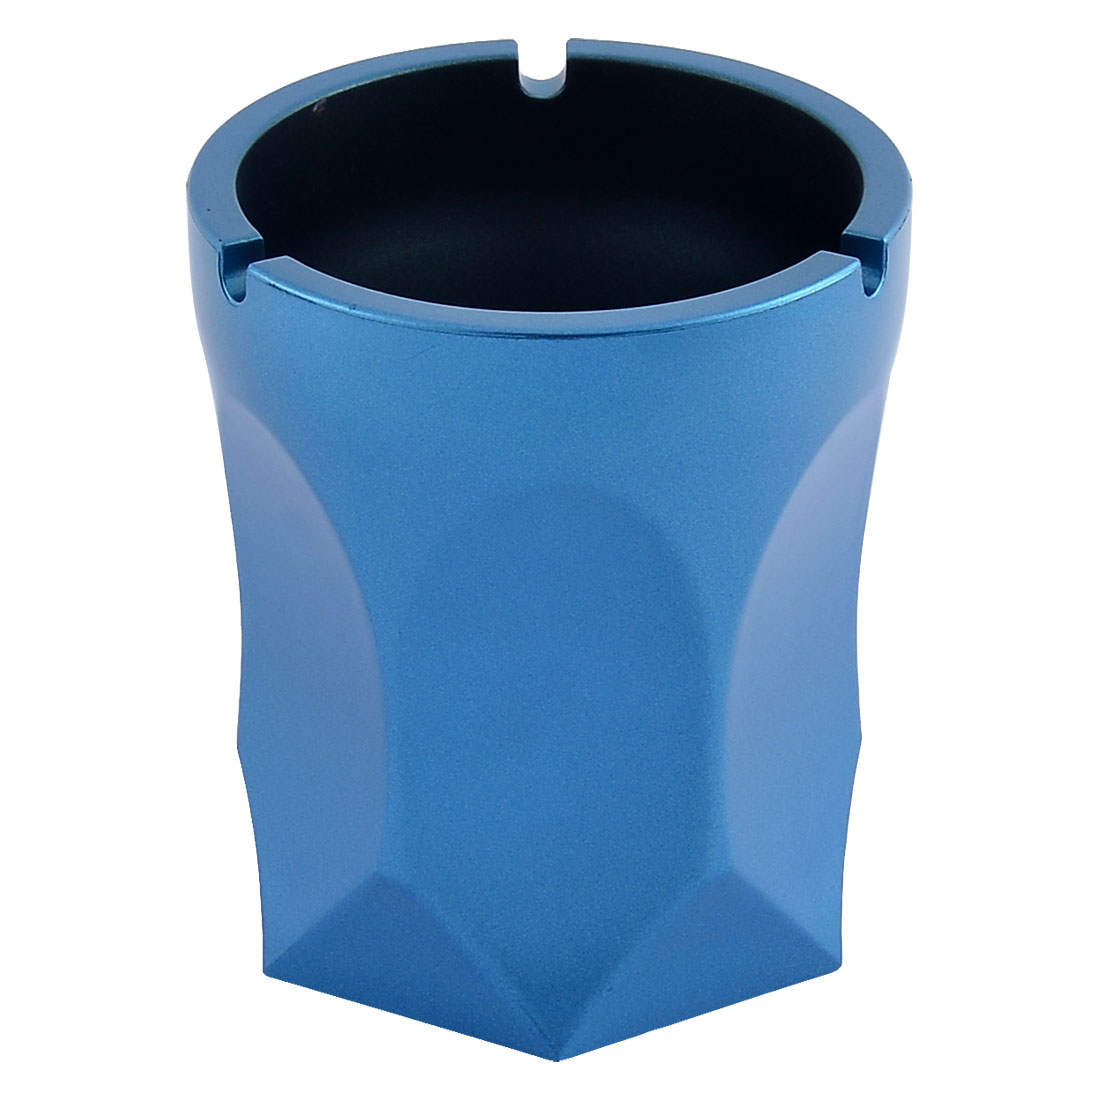 Hotel Bar Aluminium Alloy Rhomb Smoke Cigarette Ash Container Ashtray Blue